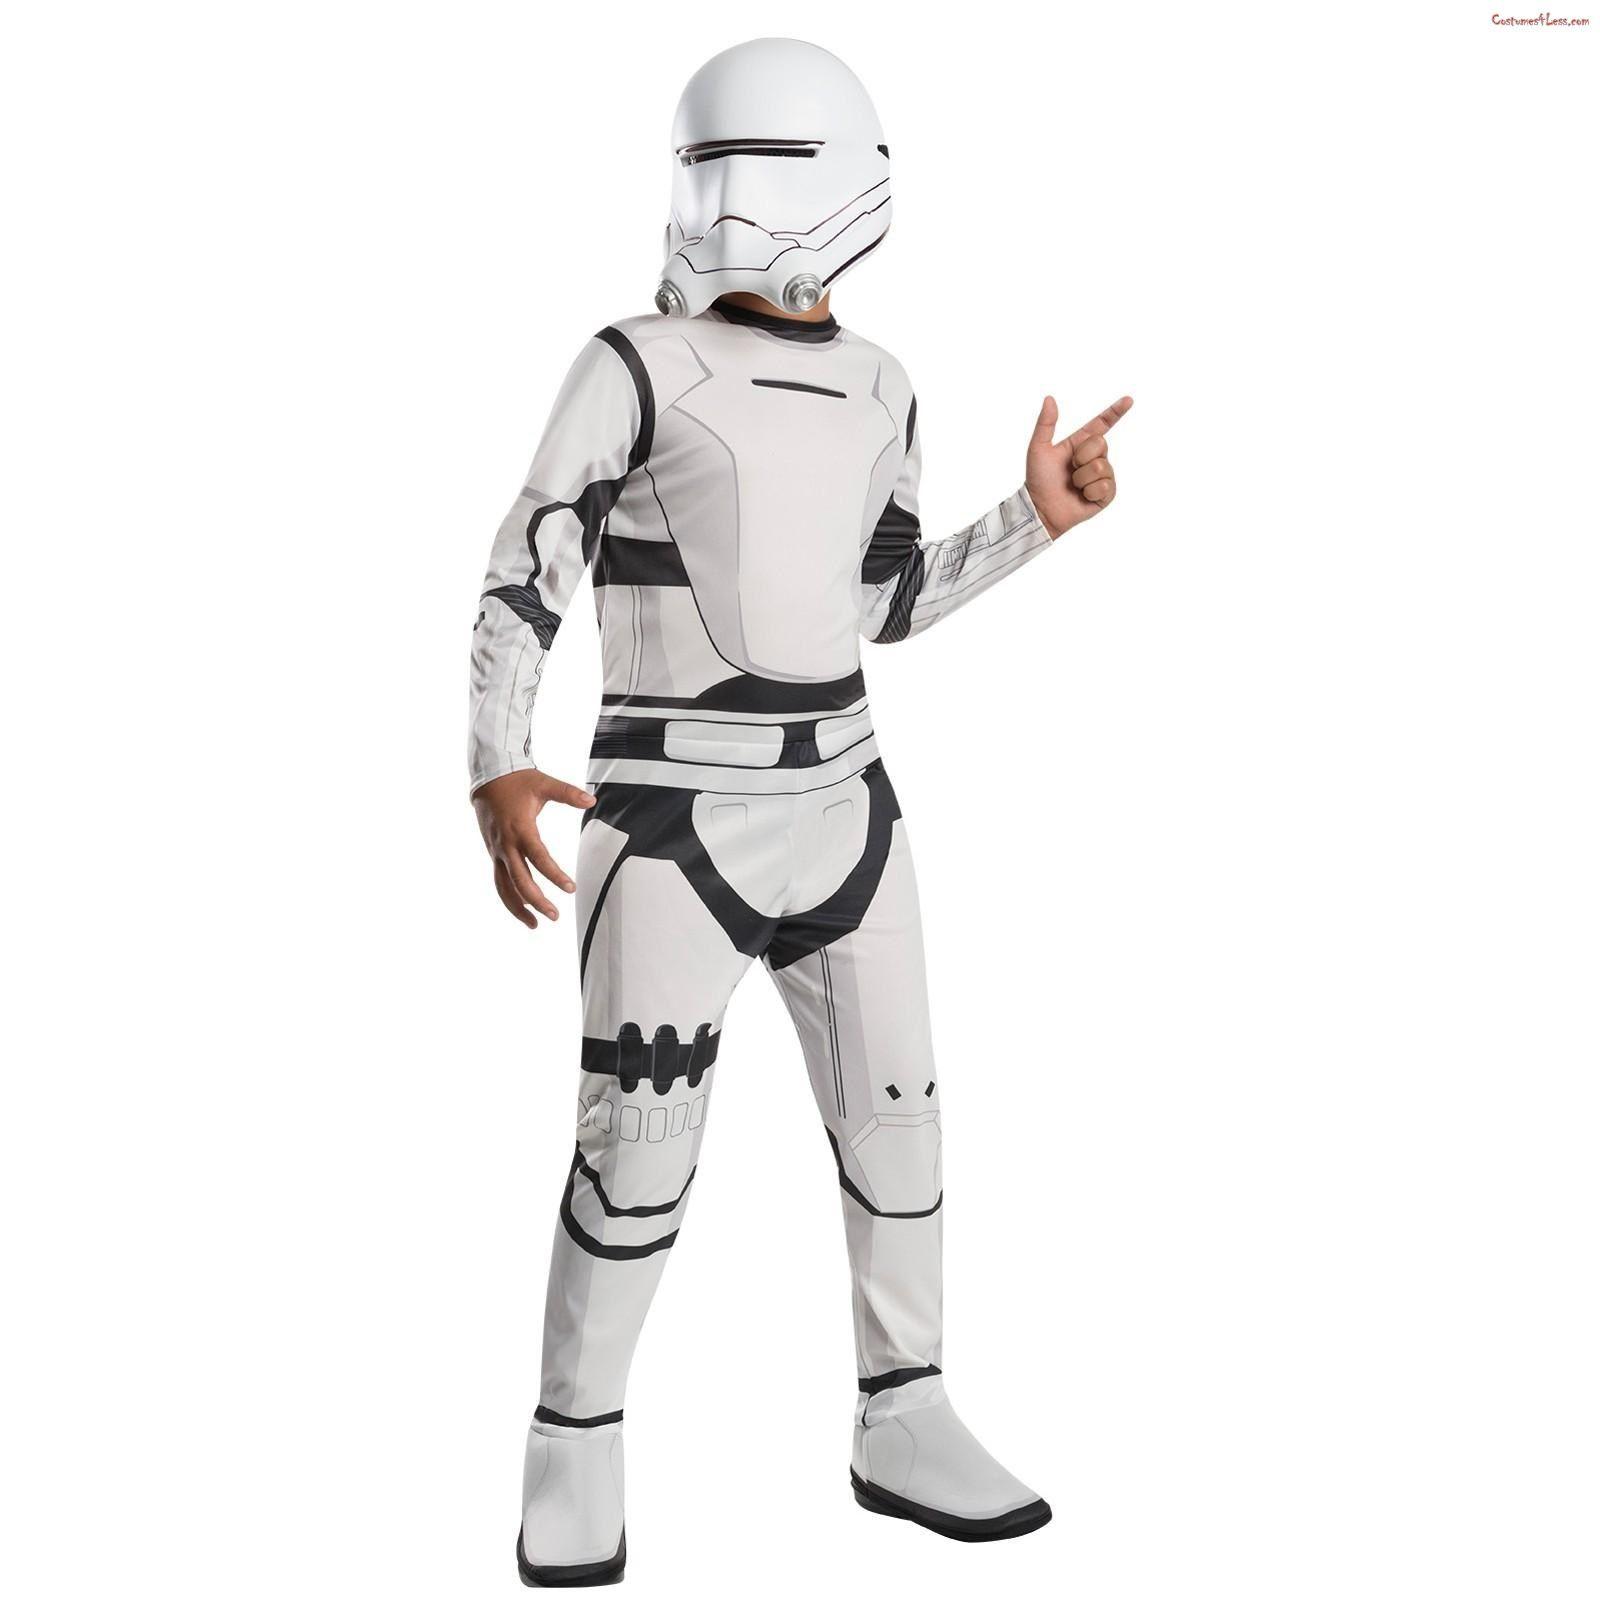 Star Wars Episode 7 Boys Classic Flametrooper Costume Episode Wars Star Star Wars Costumes Star Wars Kids Star Wars Vii